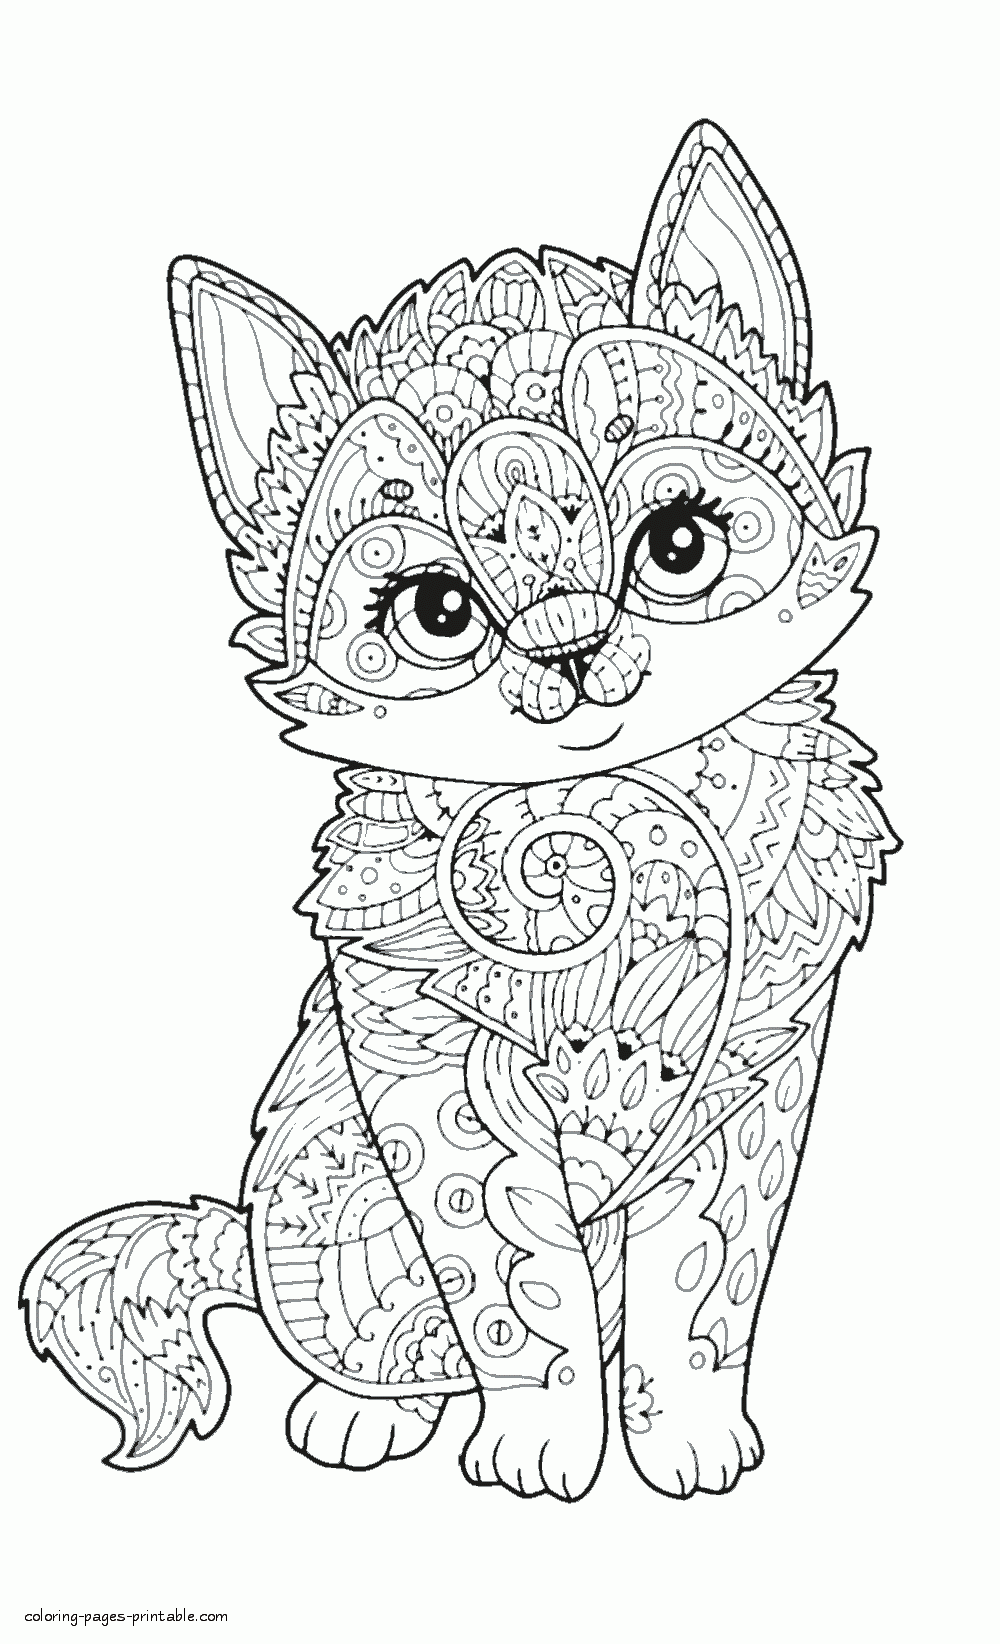 2c234c4318b8769cd1f0e5ddbe4c0a11 » Mandala Animal Coloring Pages